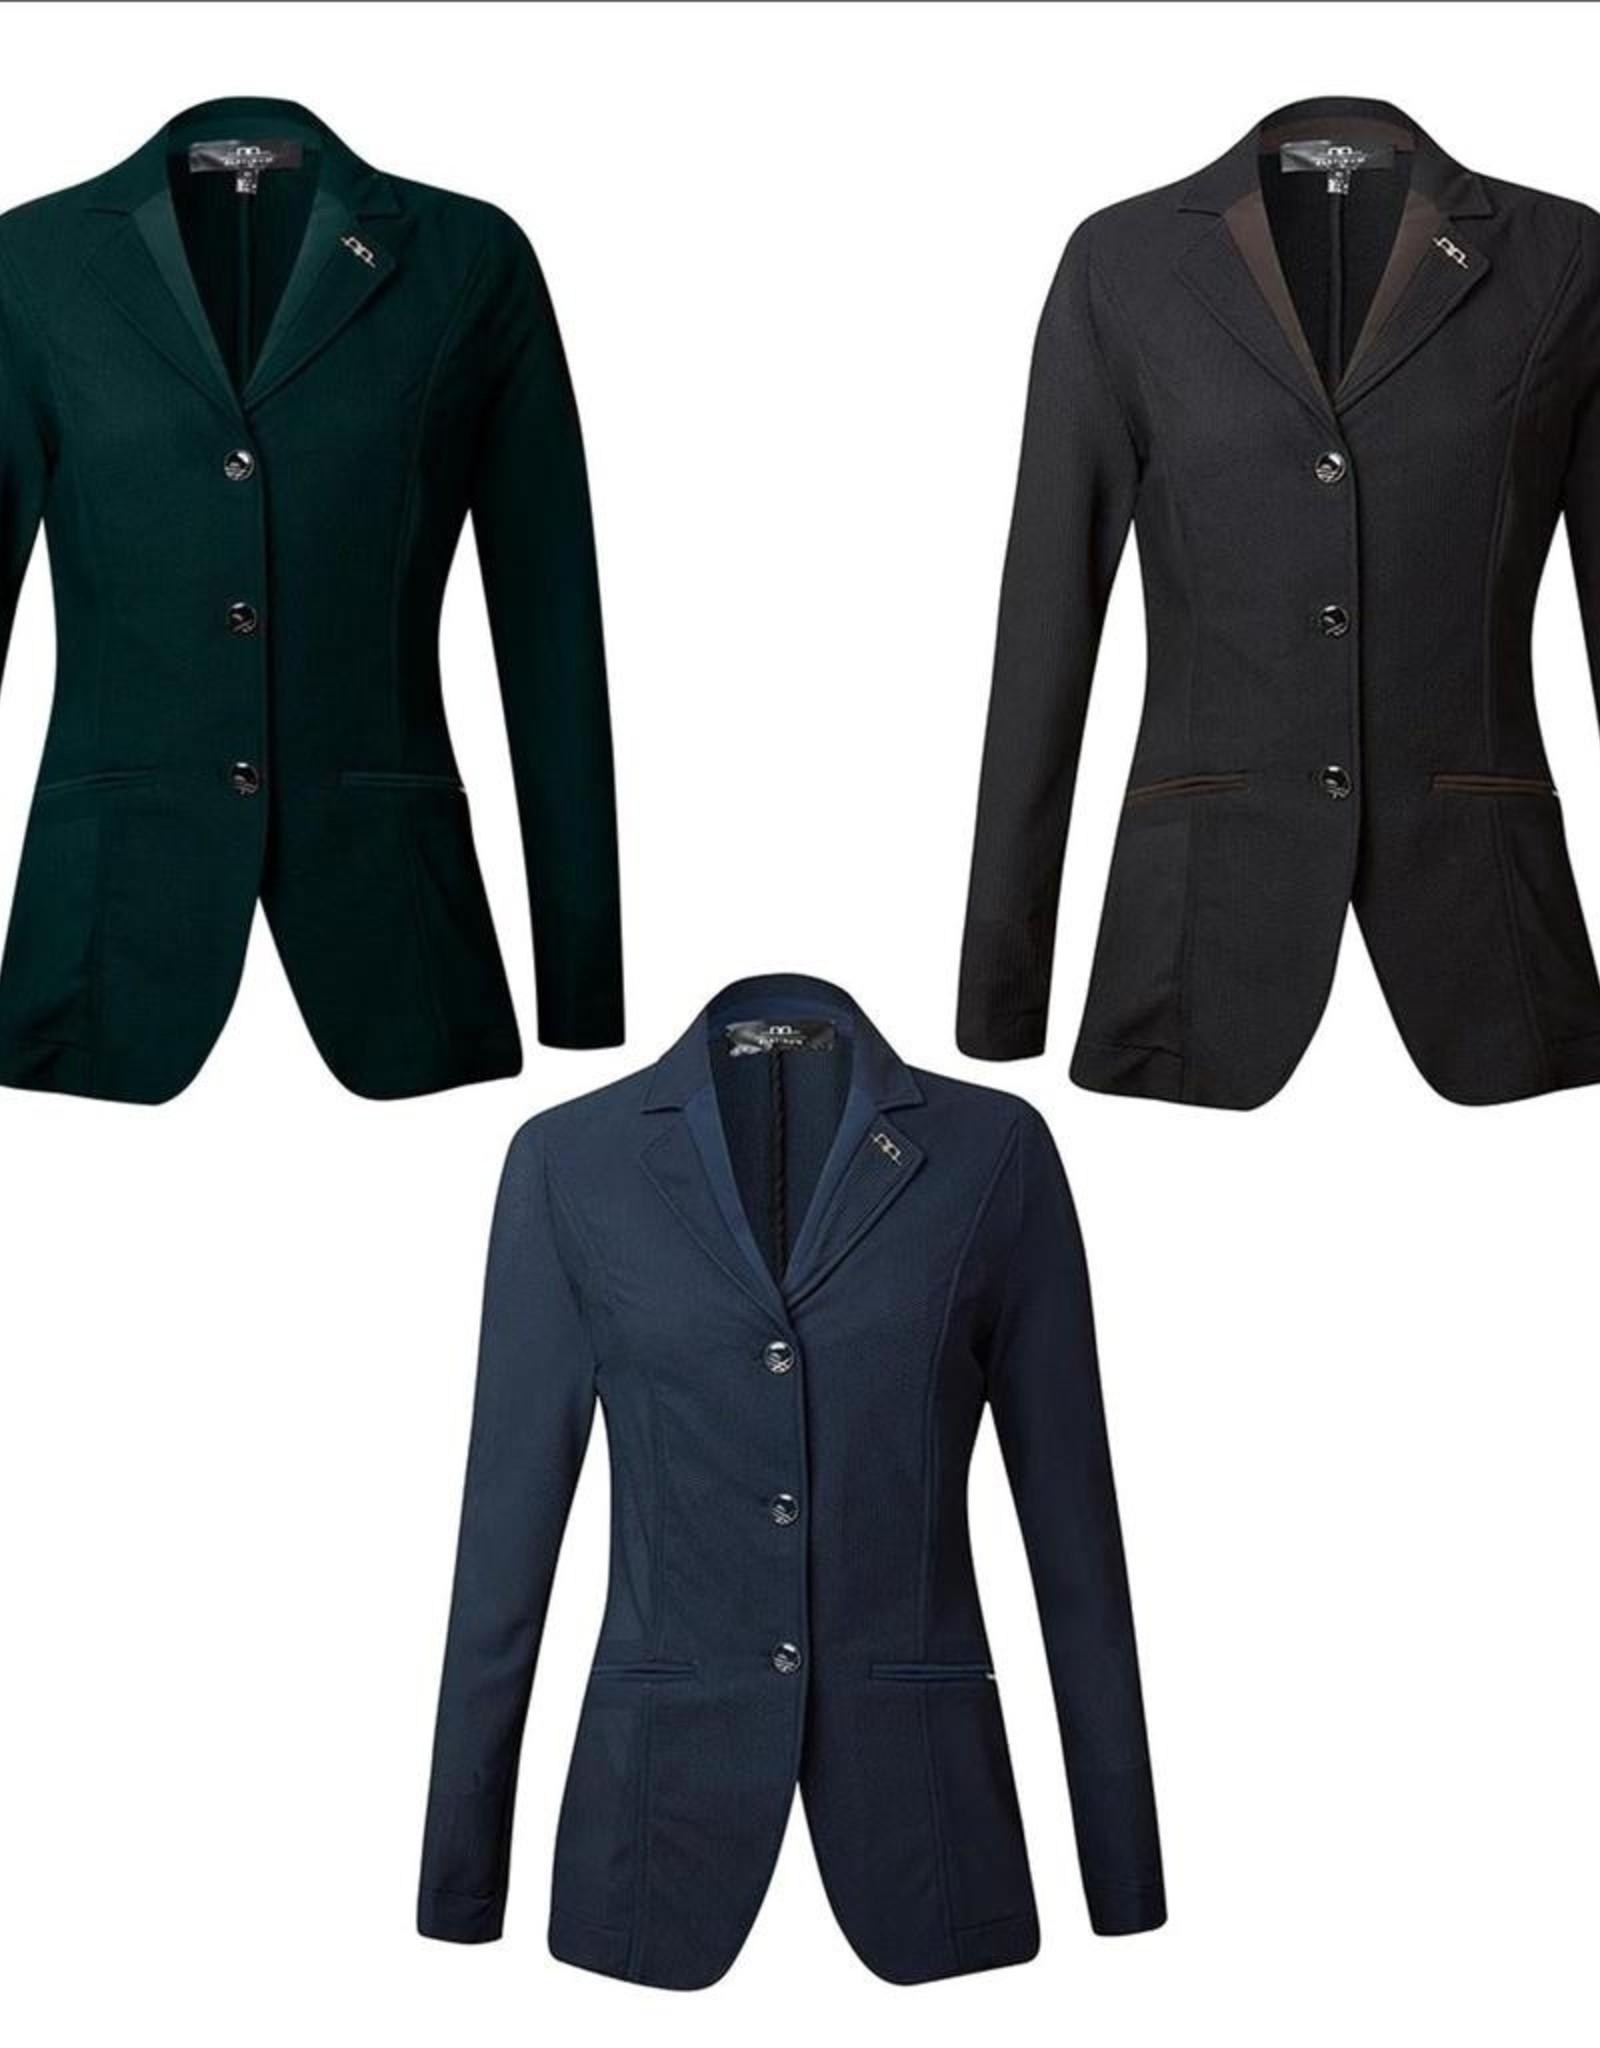 Horseware AA Ladies' Motionlite Competition Jacket